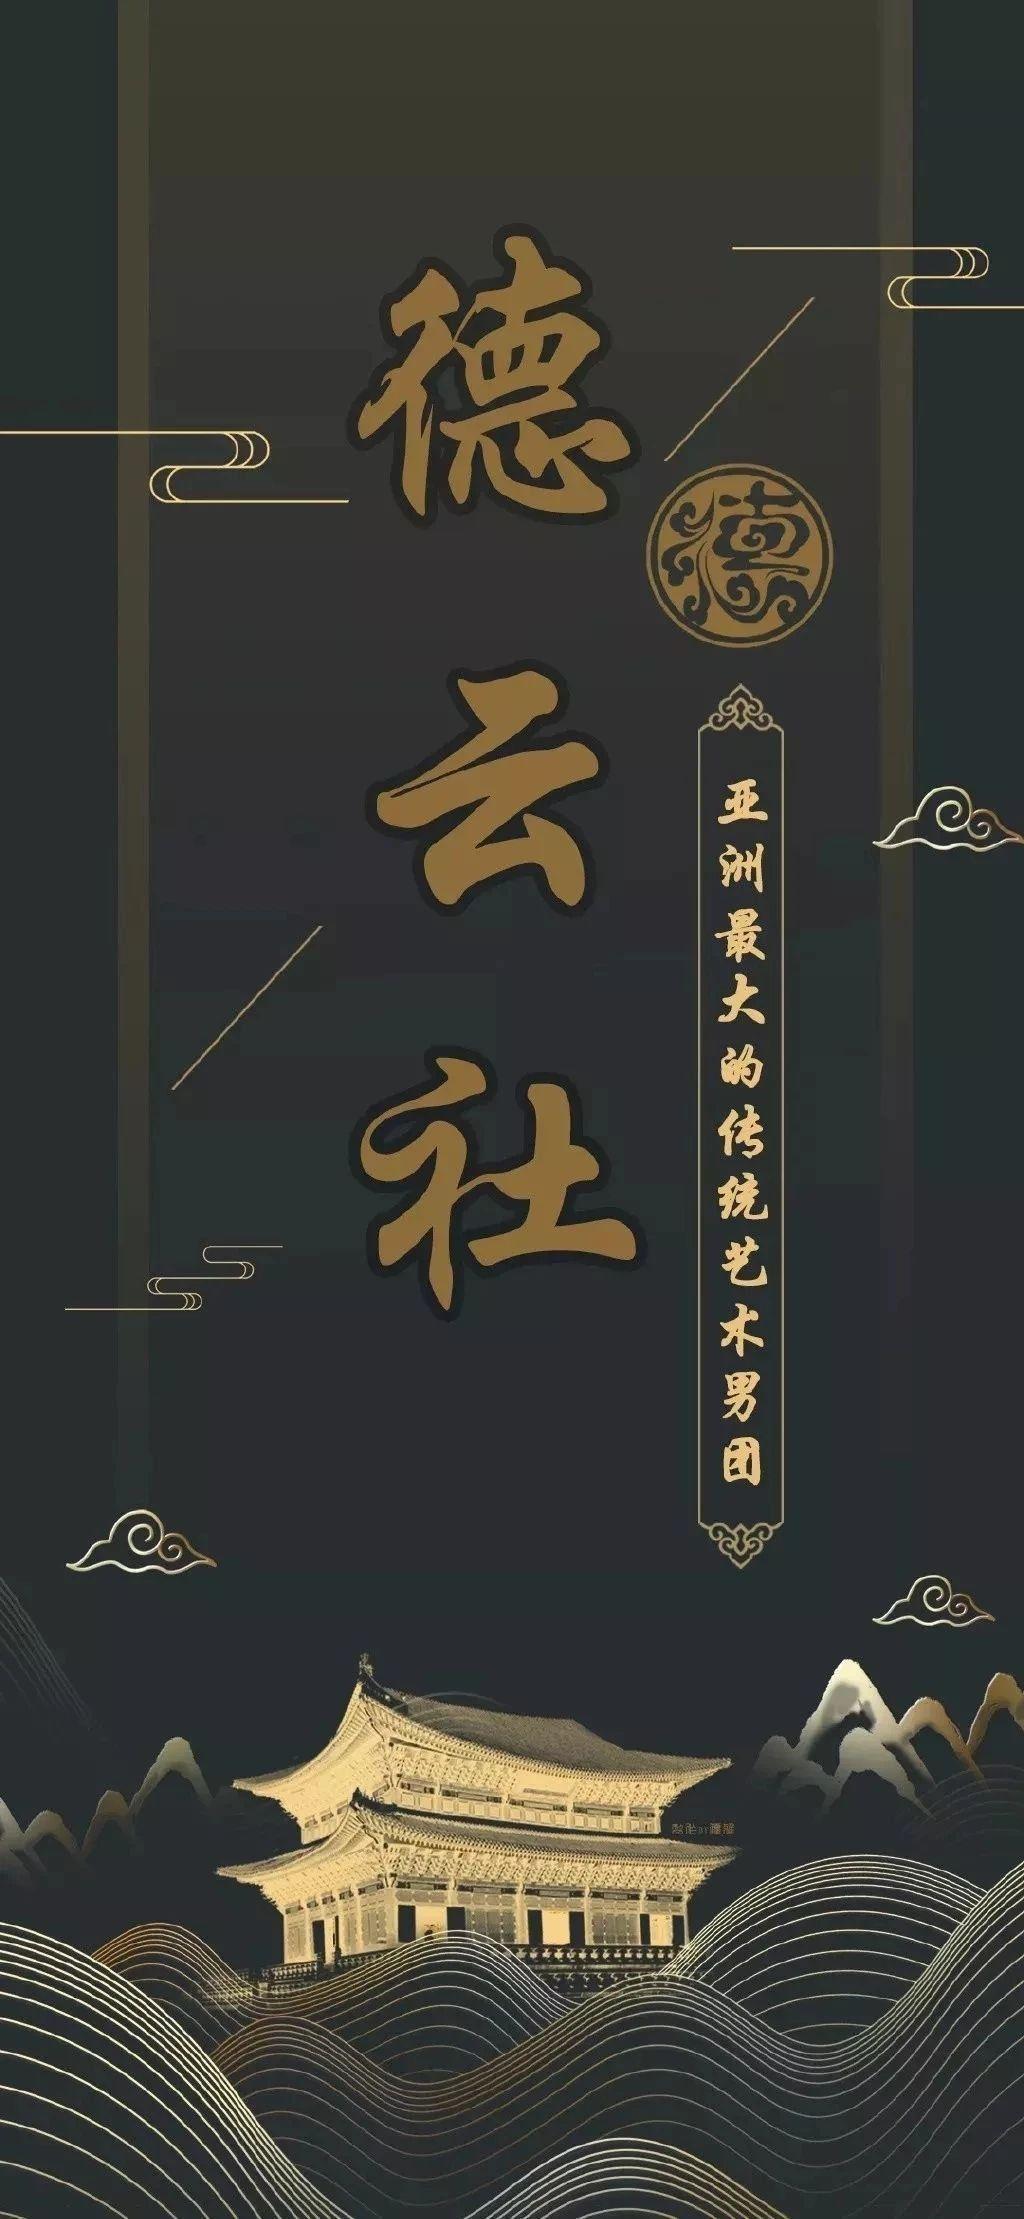 deyunshe_德云社无水印壁纸系列 - 知乎